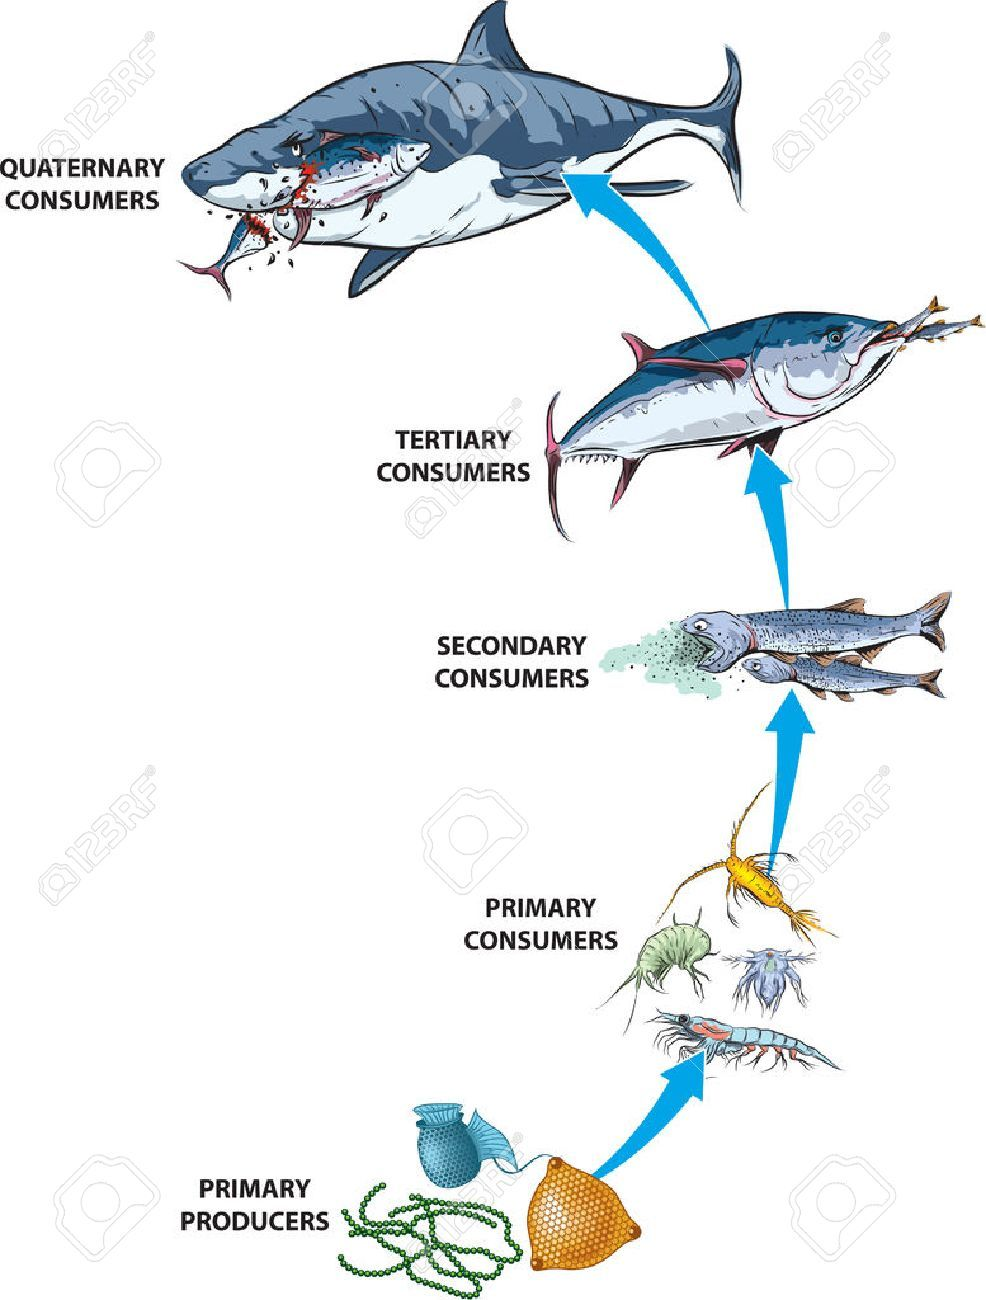 Chaine Alimentaire De L Ocean Ocean Food Chain Ocean Food Food Chain Diagram